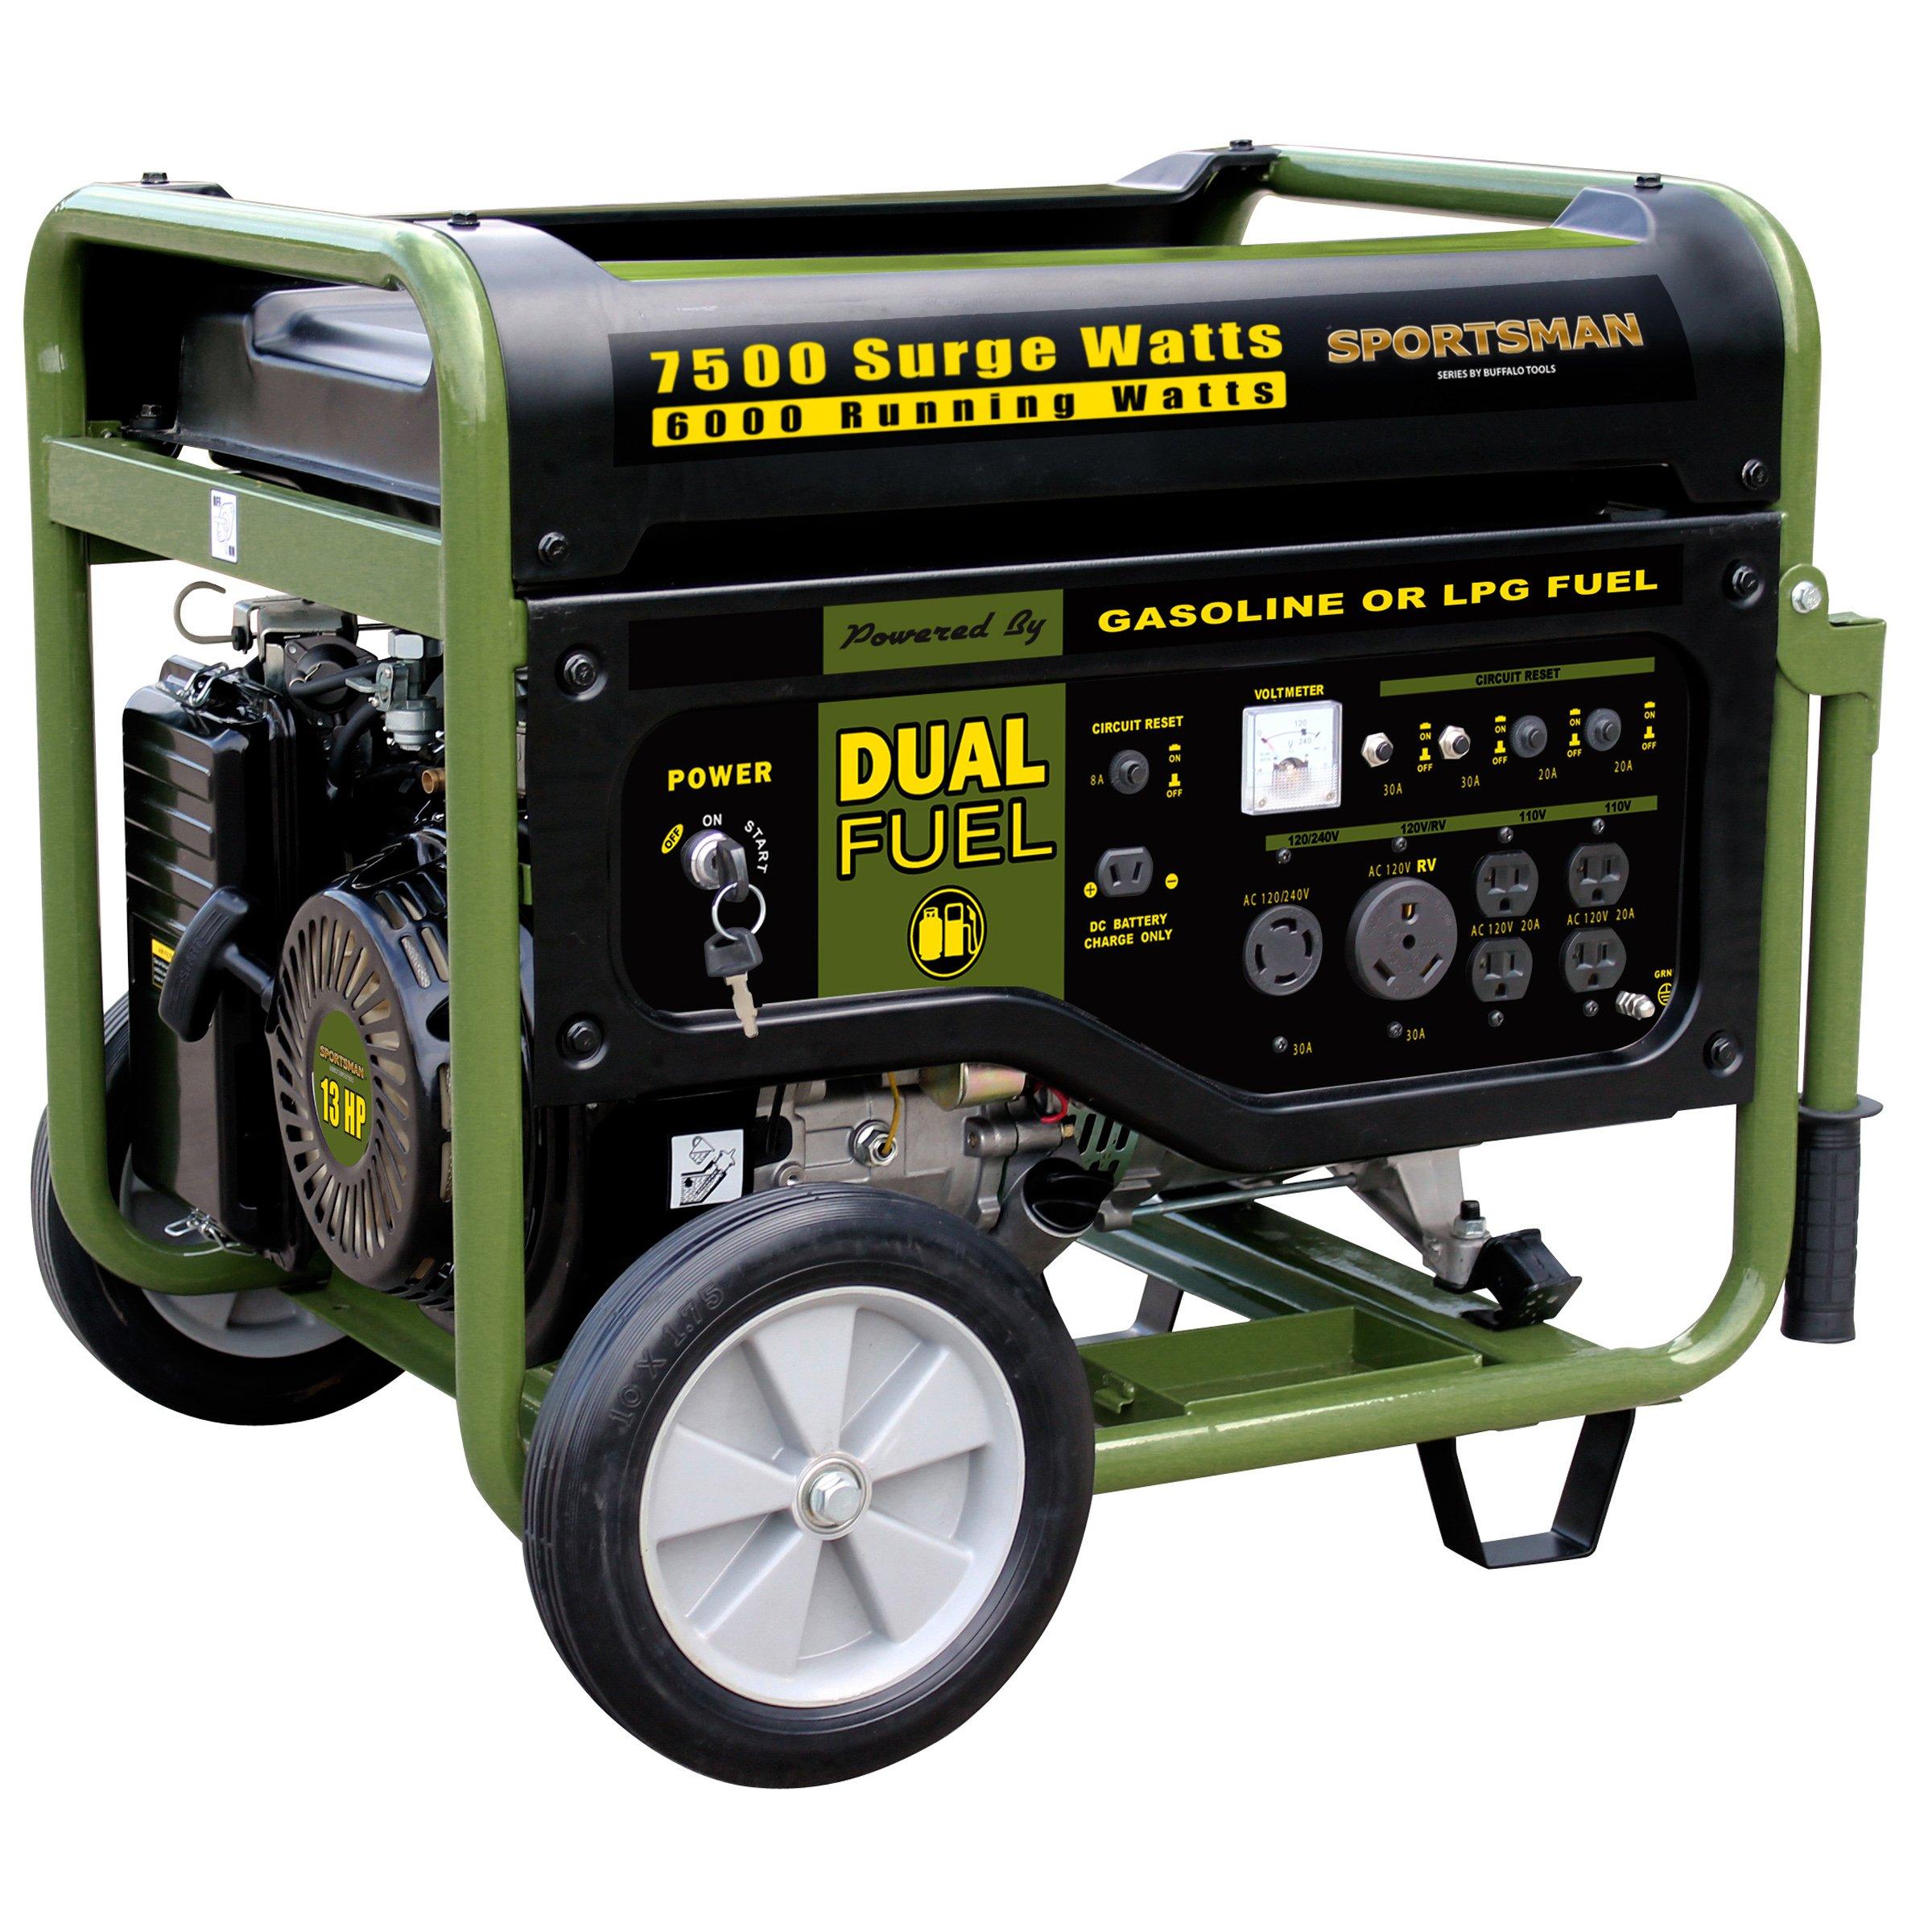 Sportsman GEN7500DF 7,500 Watt 13 HP 389cc OVH 4-Stroke Gas/Propane Powered Portable Generator With Electric Start